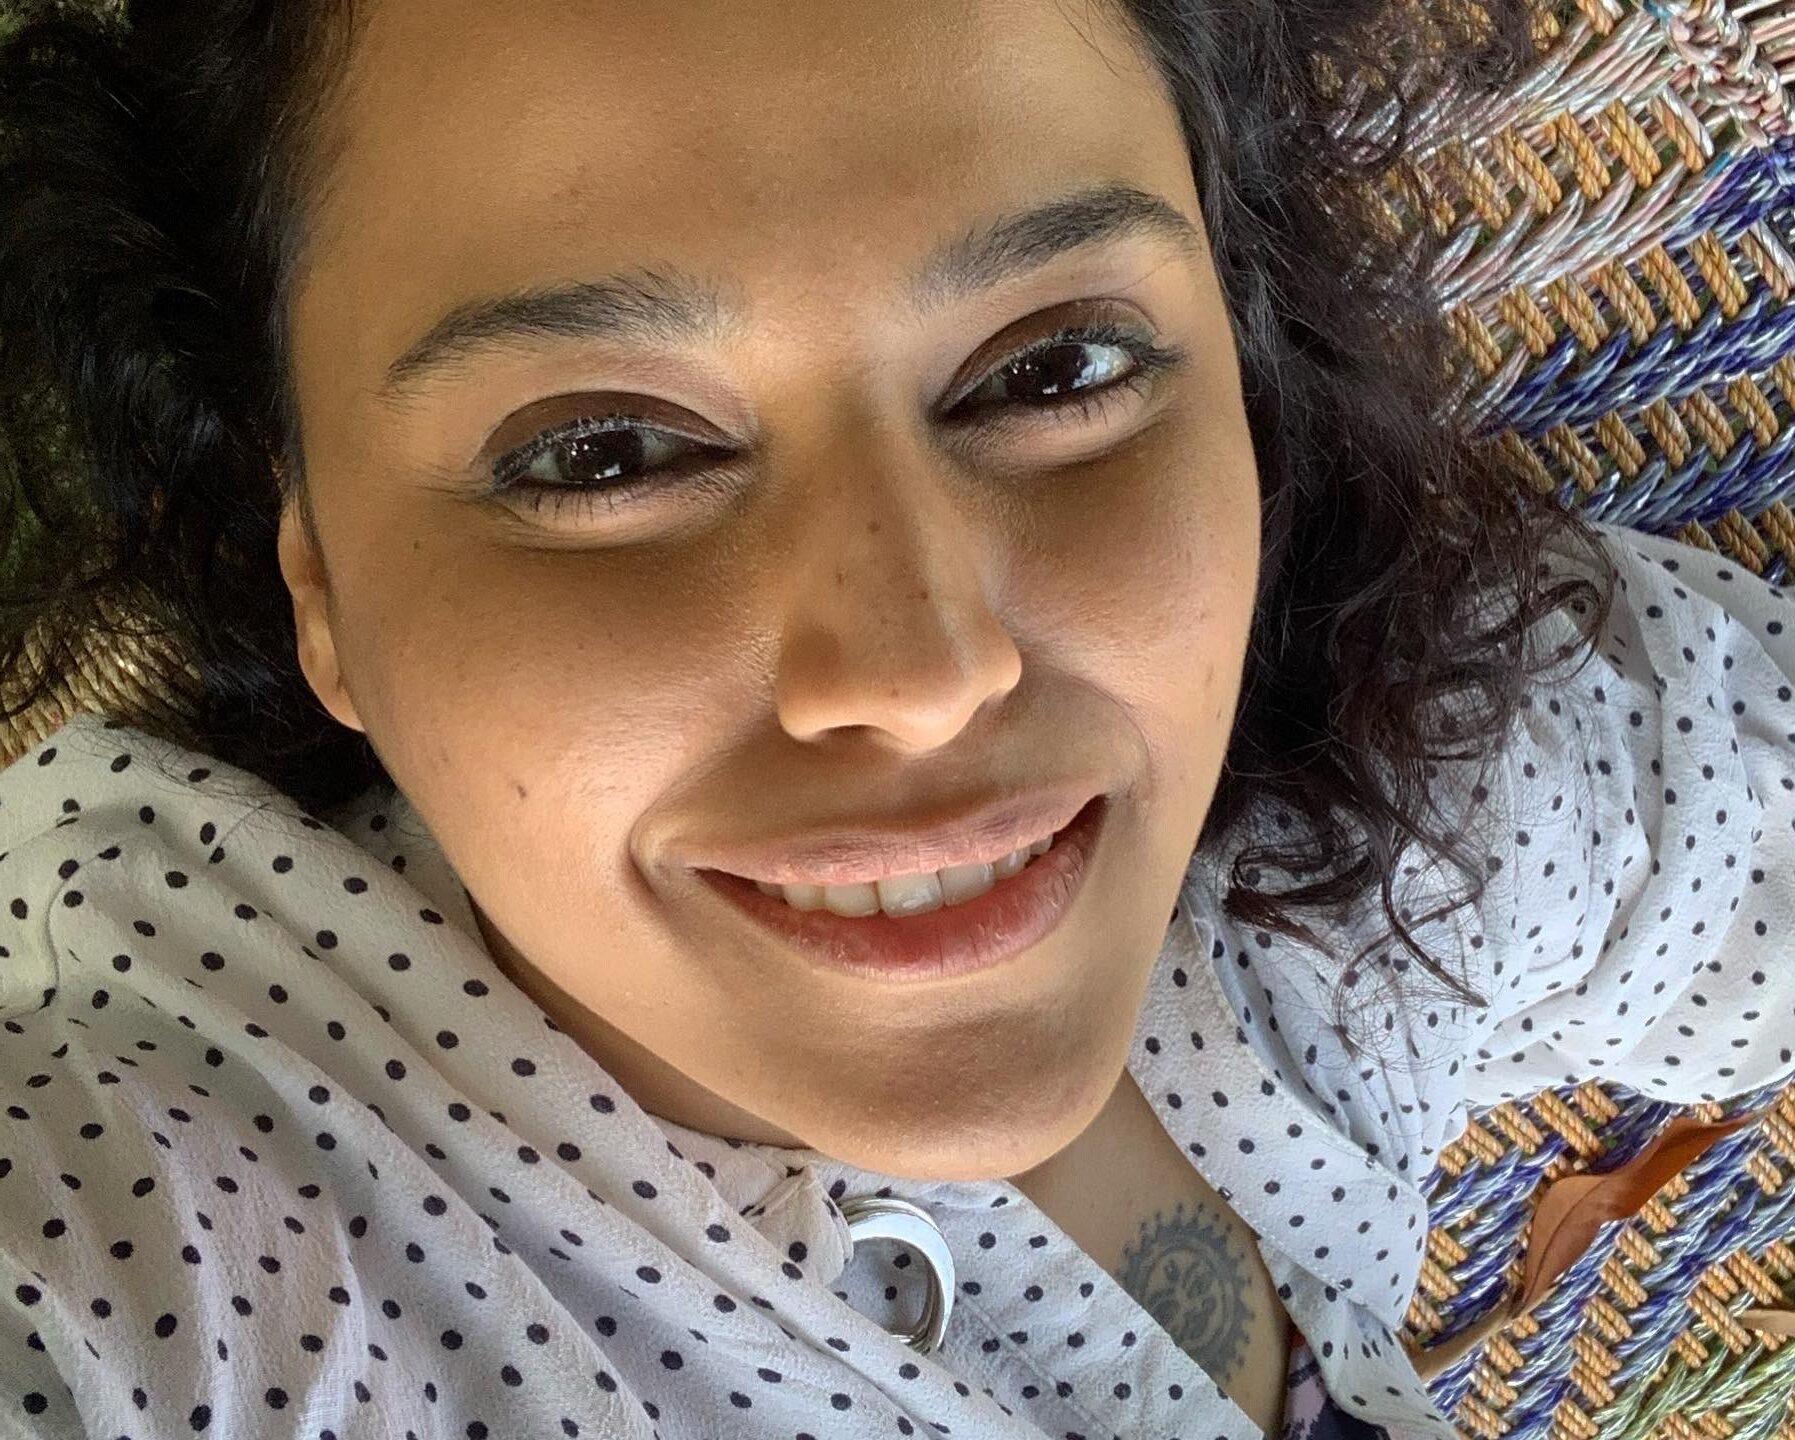 Swara Bhasker latest photo showing her tattoo on chest